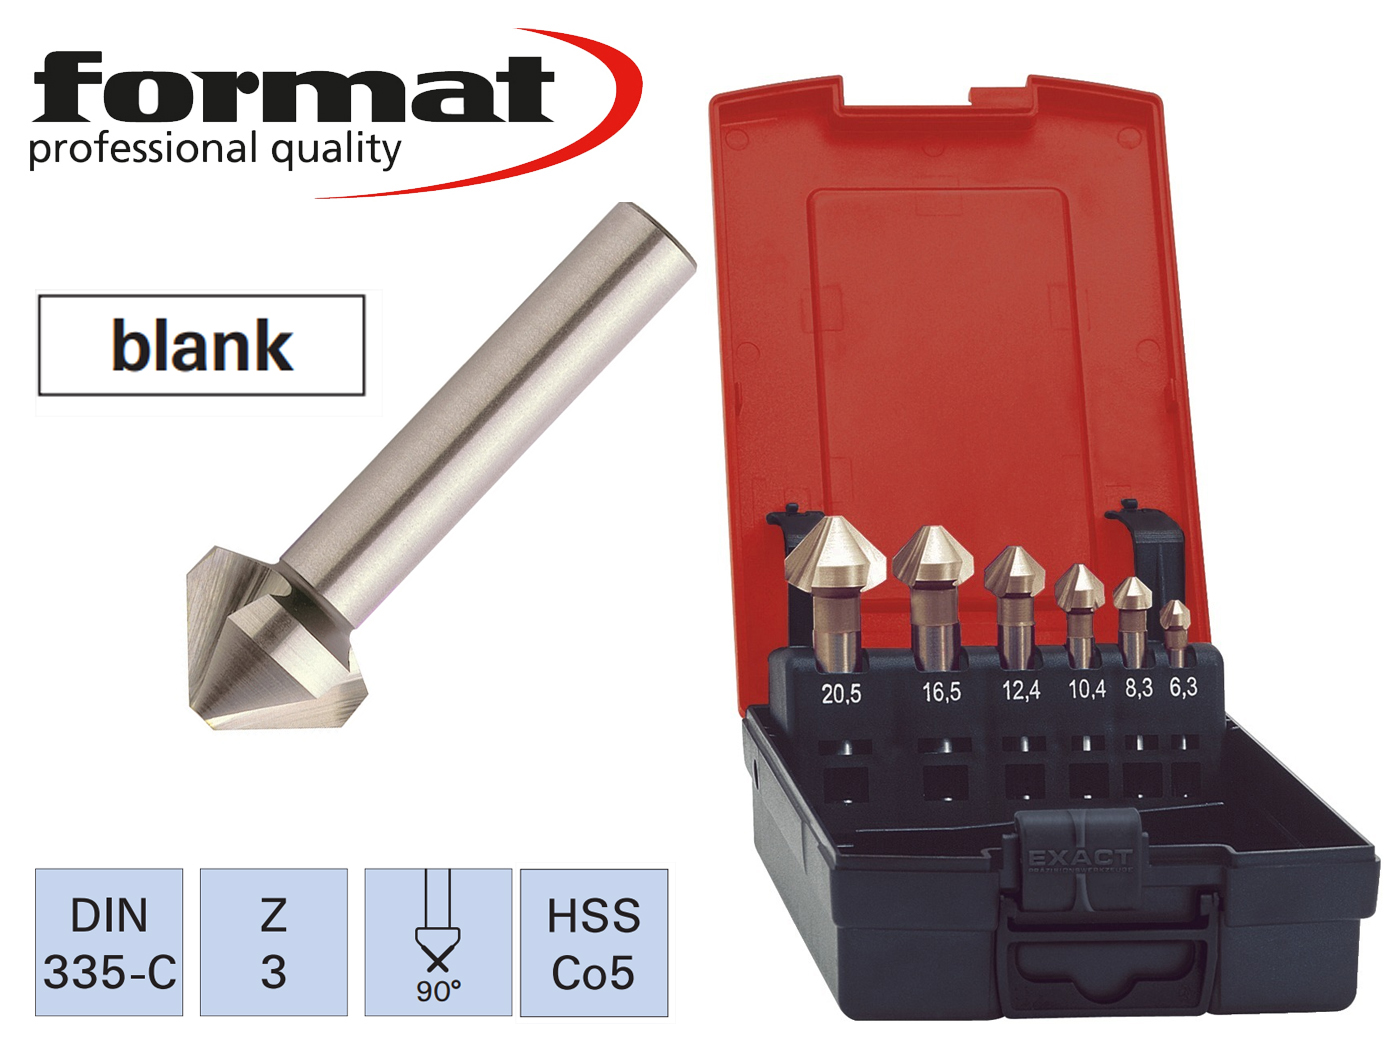 verzinkborenset DIN 335 C HSS 90 G FORMAT   DKMTools - DKM Tools